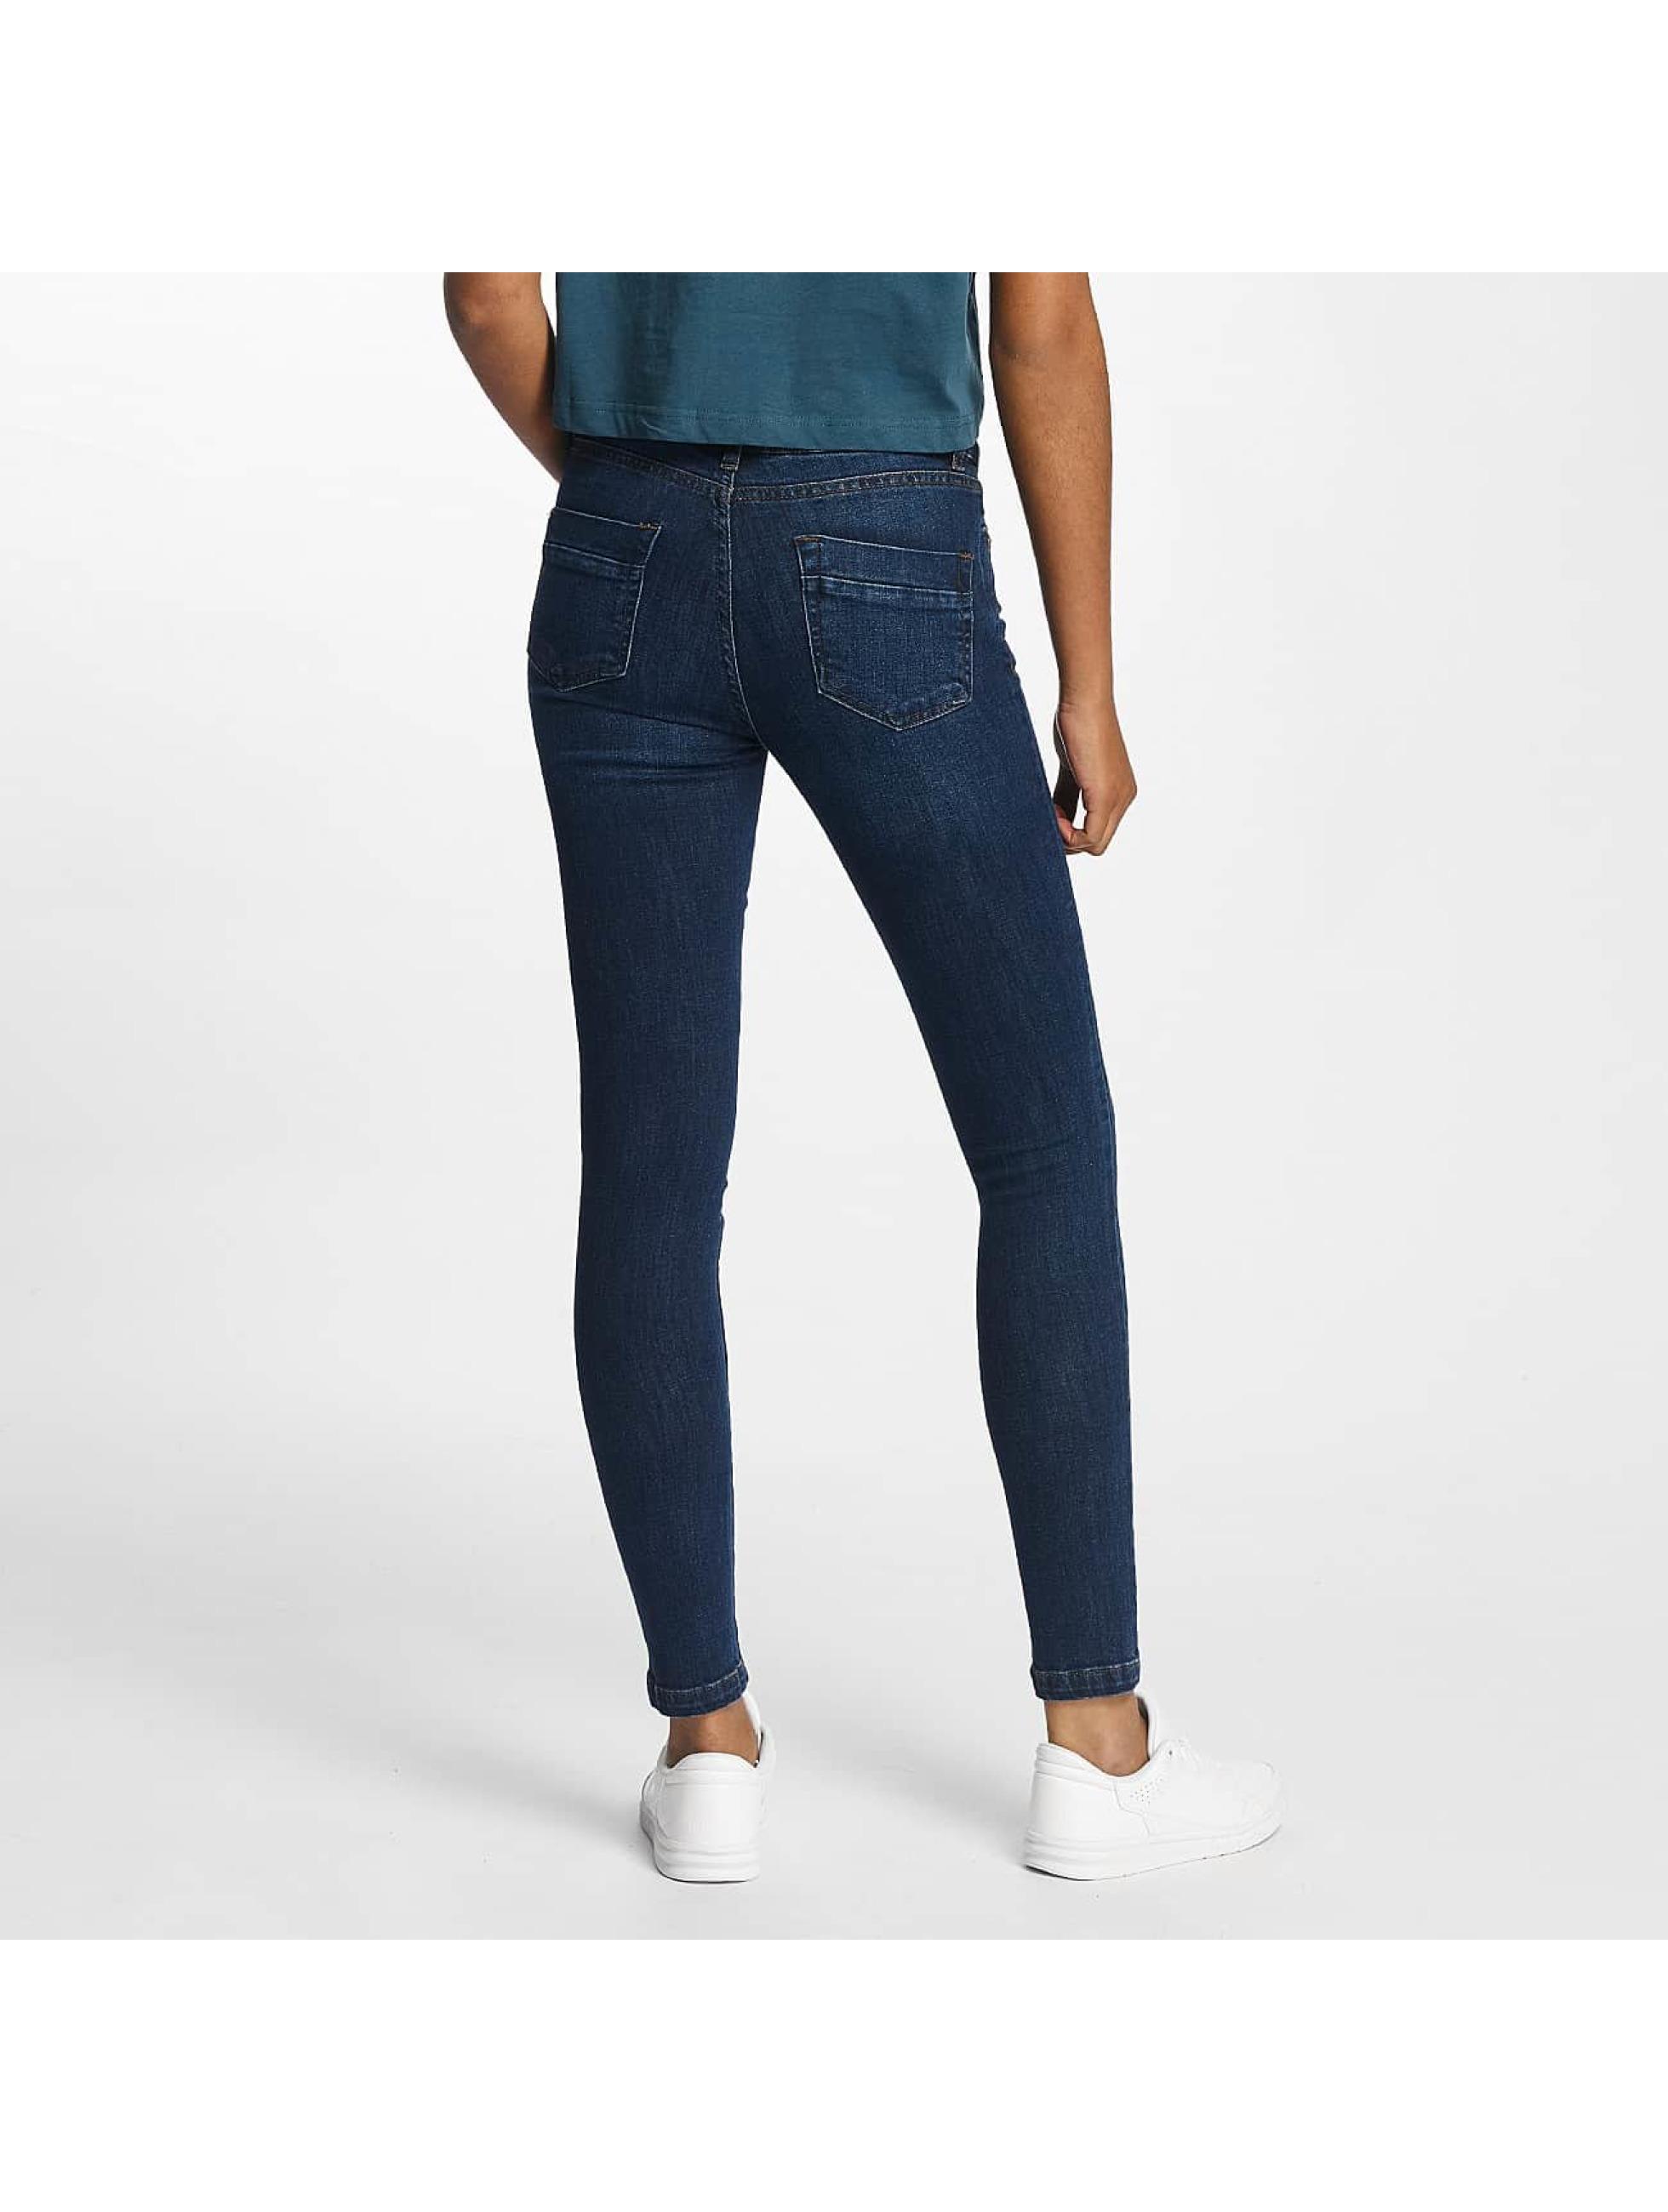 Urban Classics Skinny Jeans Skinny Denim niebieski